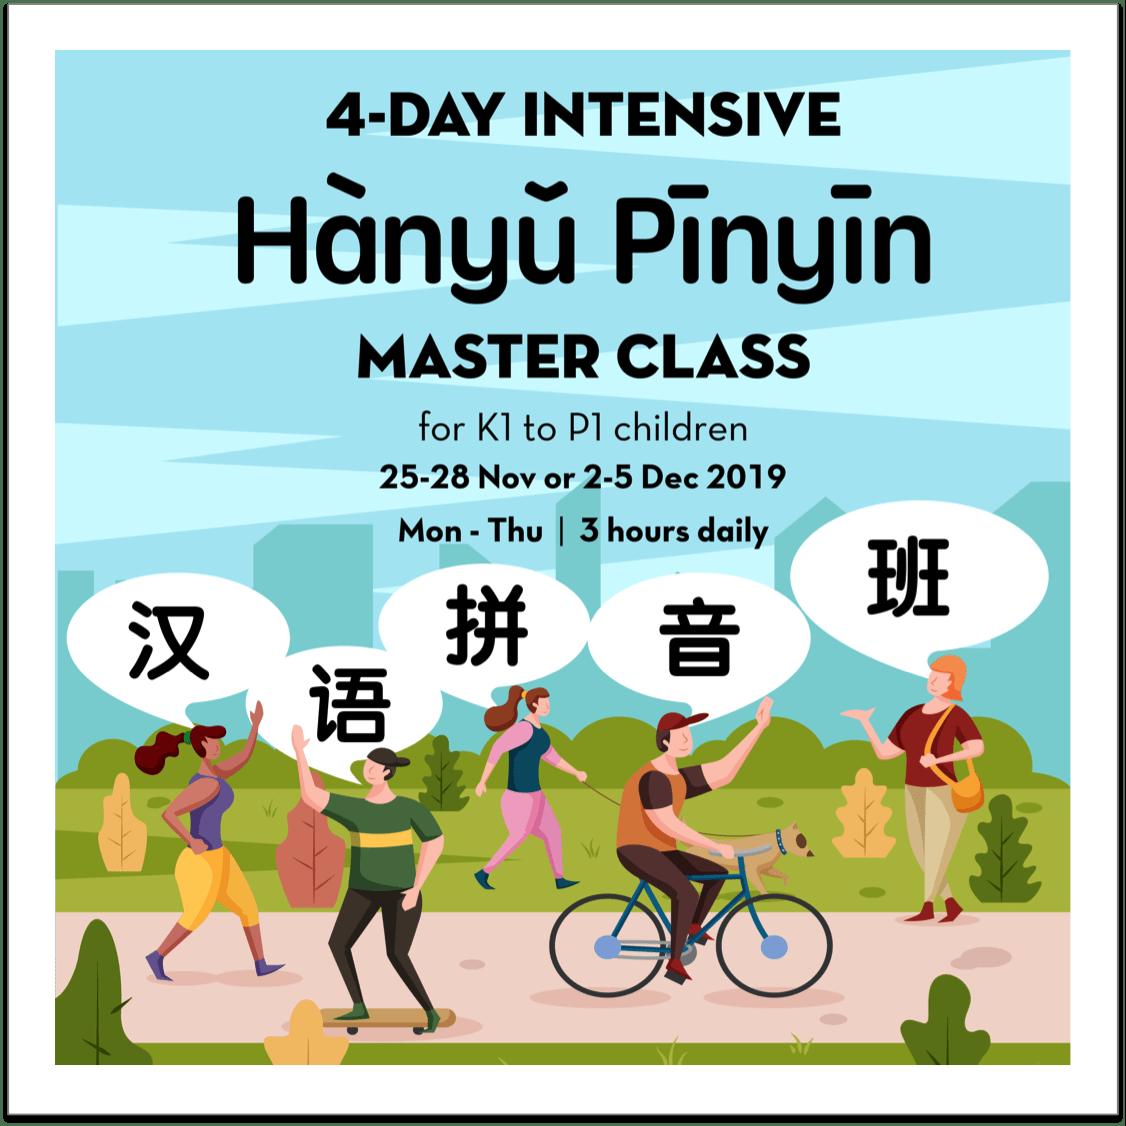 Nov / Dec 2019 Hanyu Pinyin Master Class